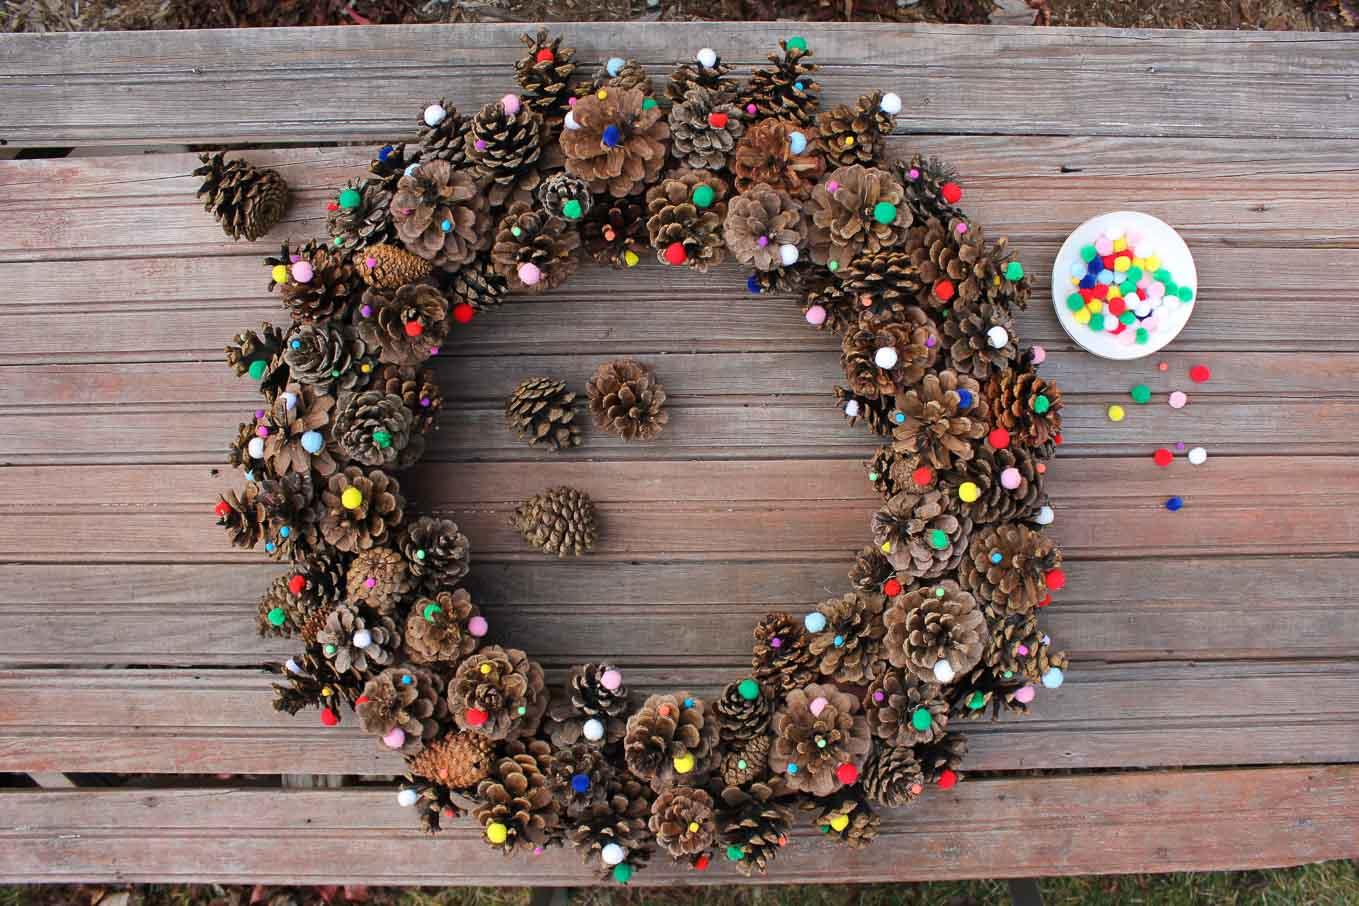 DIY pinecone wreath with pompoms